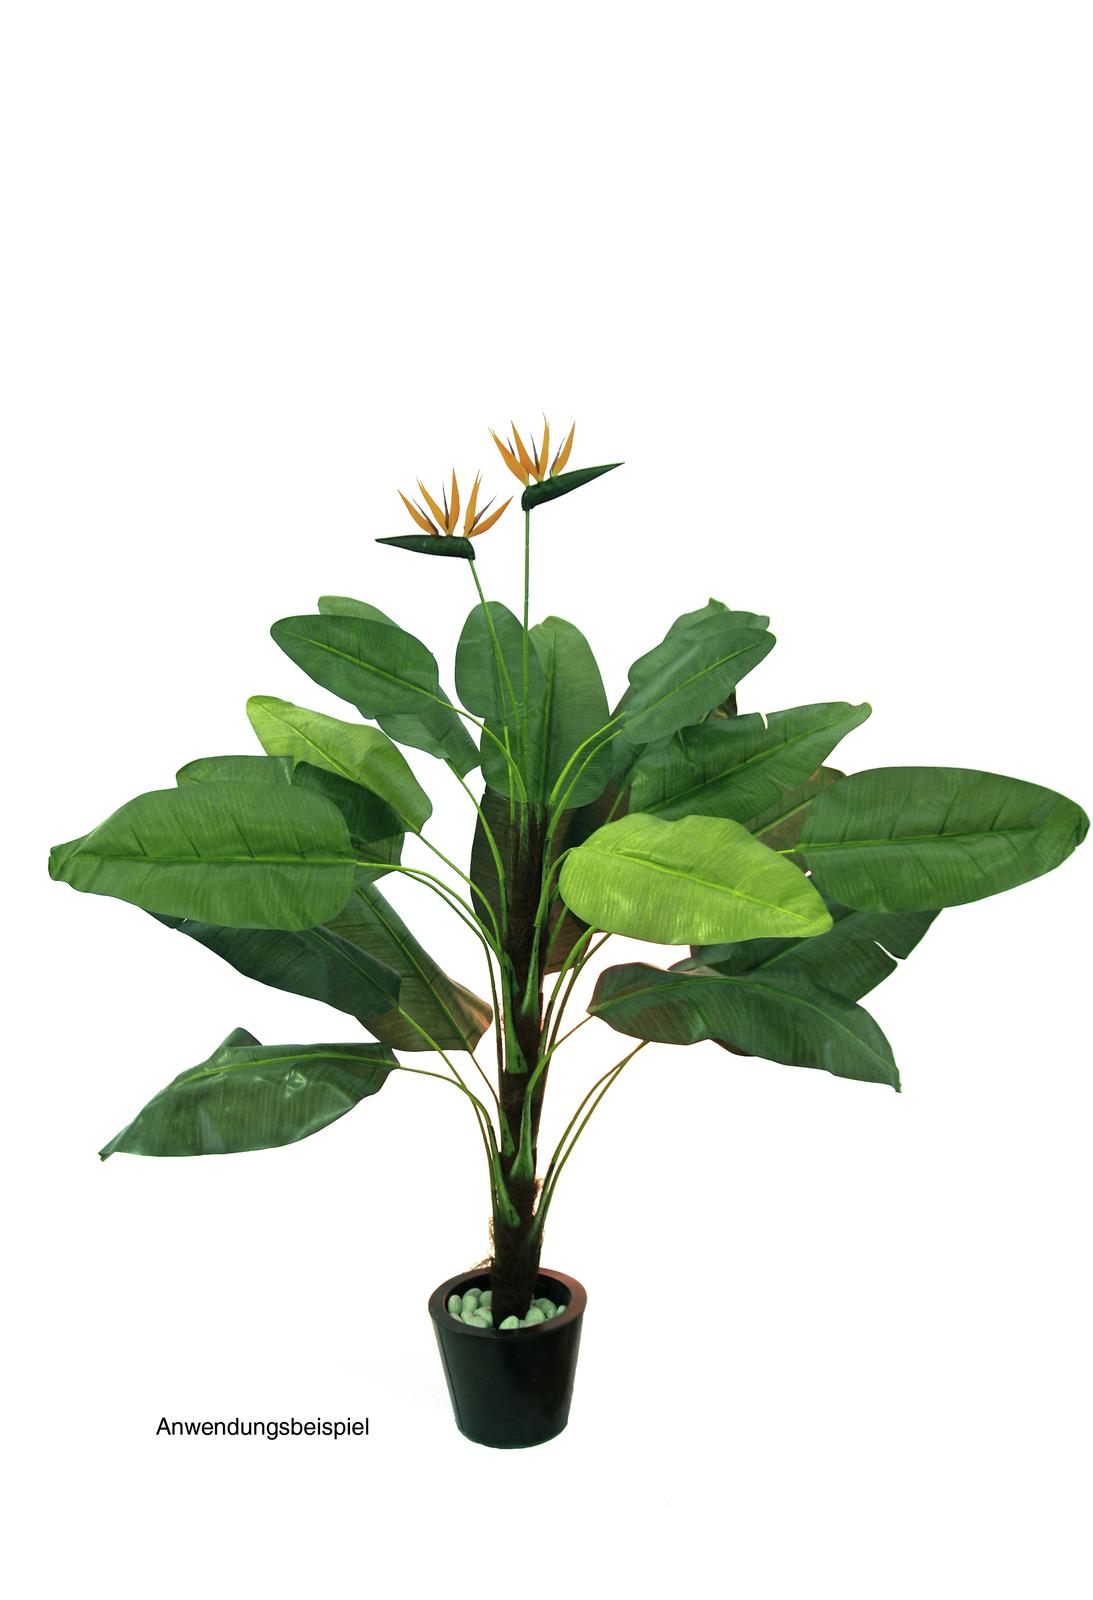 EUROPALMS pianta artificiale parzialmente naturale Tralizia, 230cm